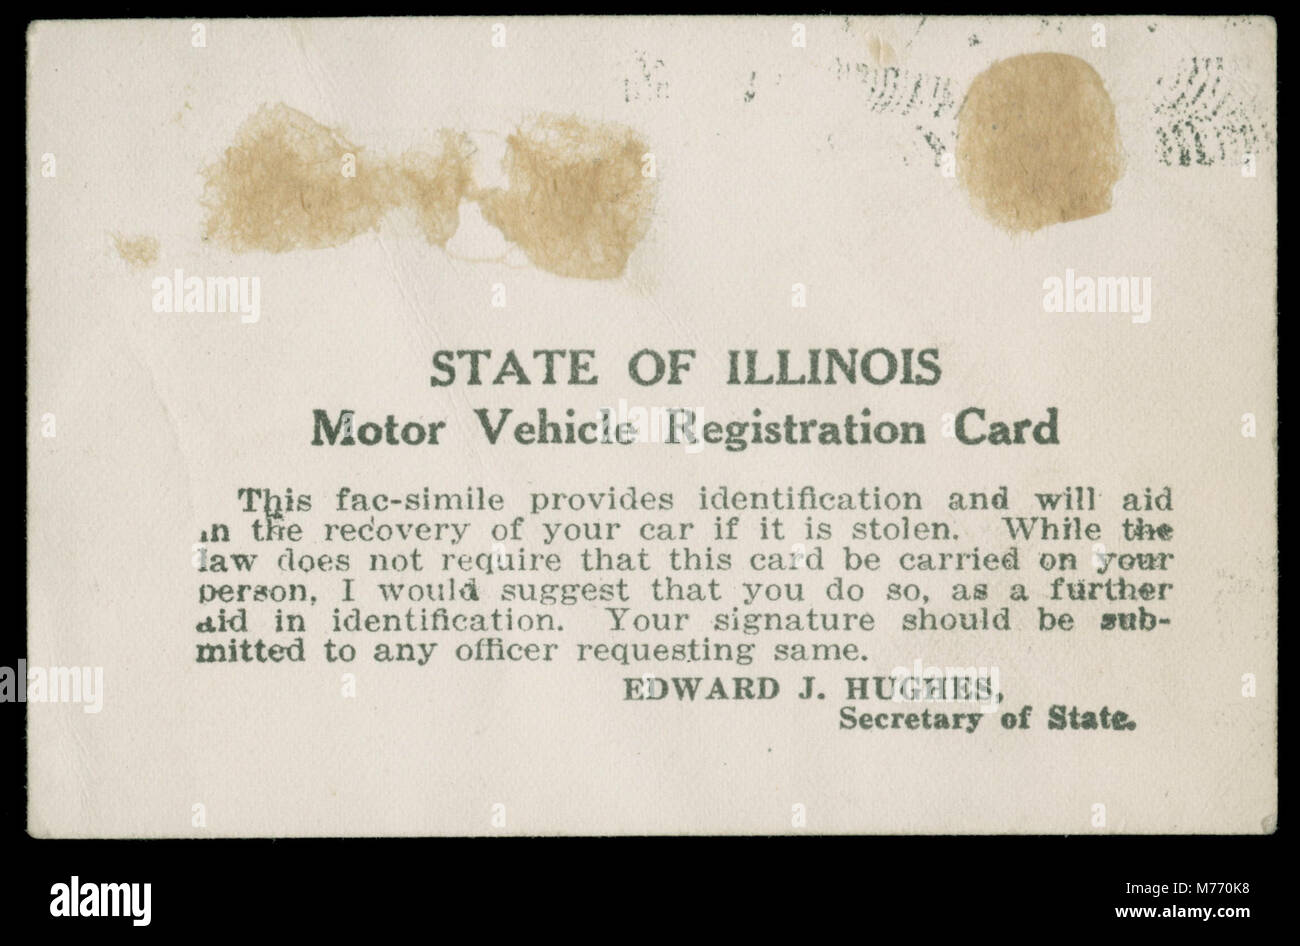 Motor Vehicle Registration Stock Photos & Motor Vehicle